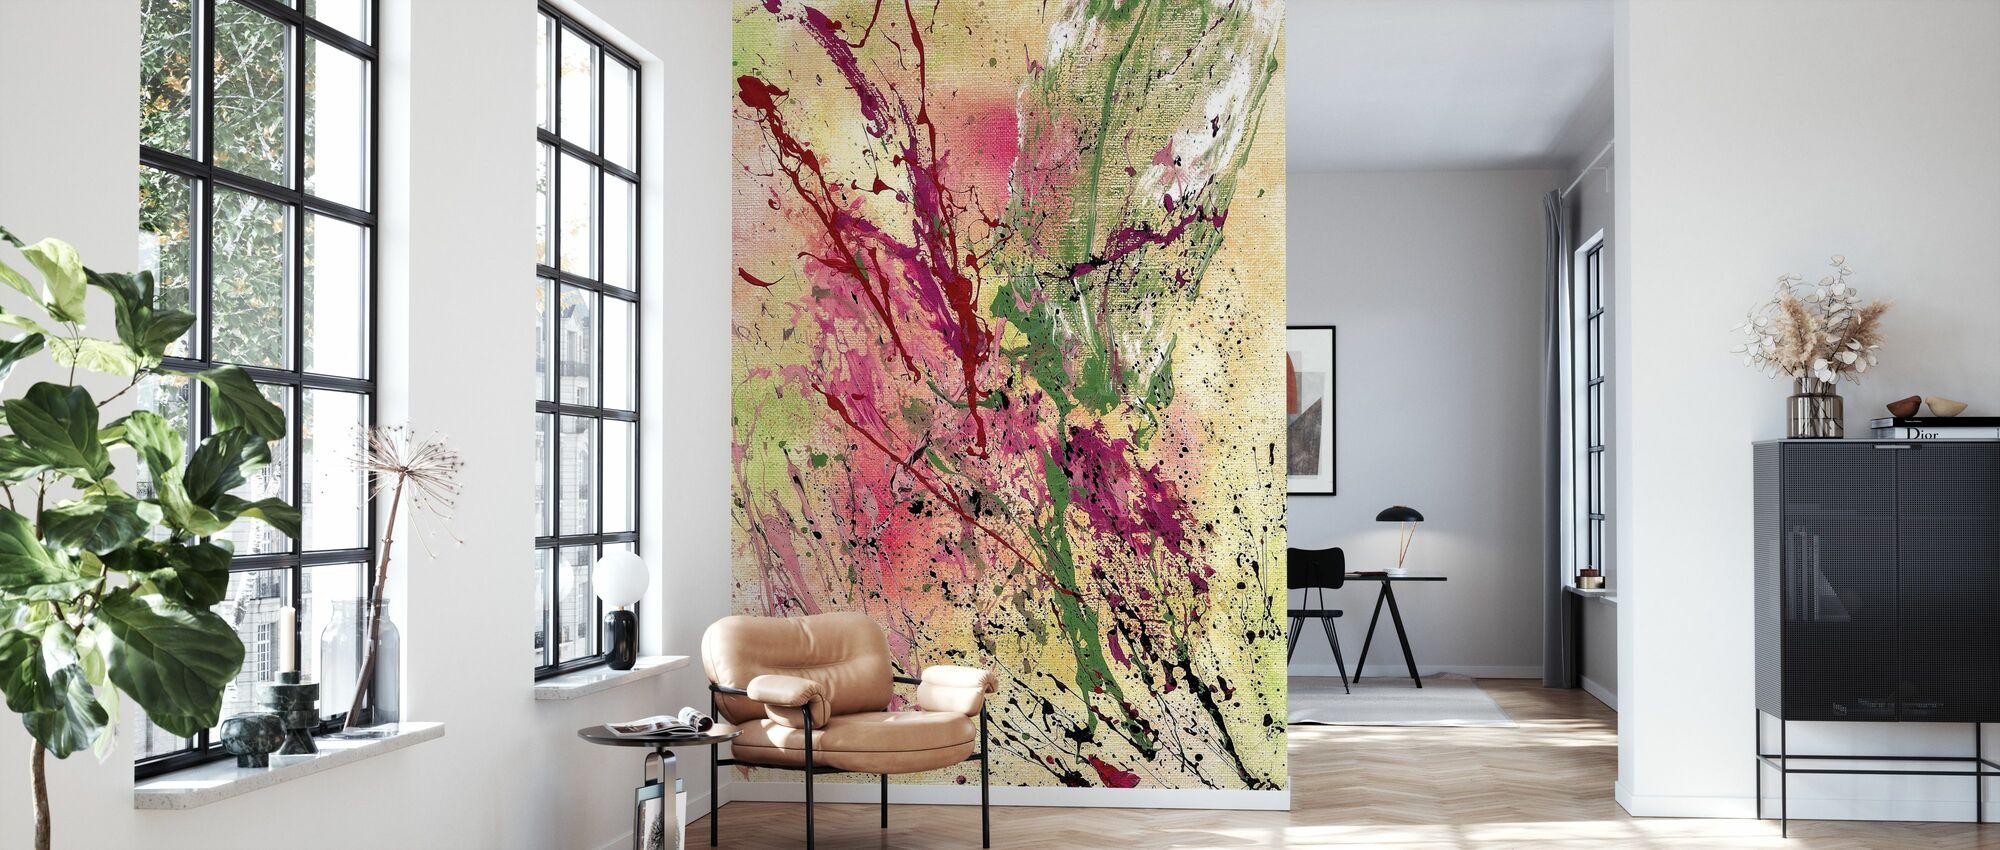 Champagne - Wallpaper - Living Room